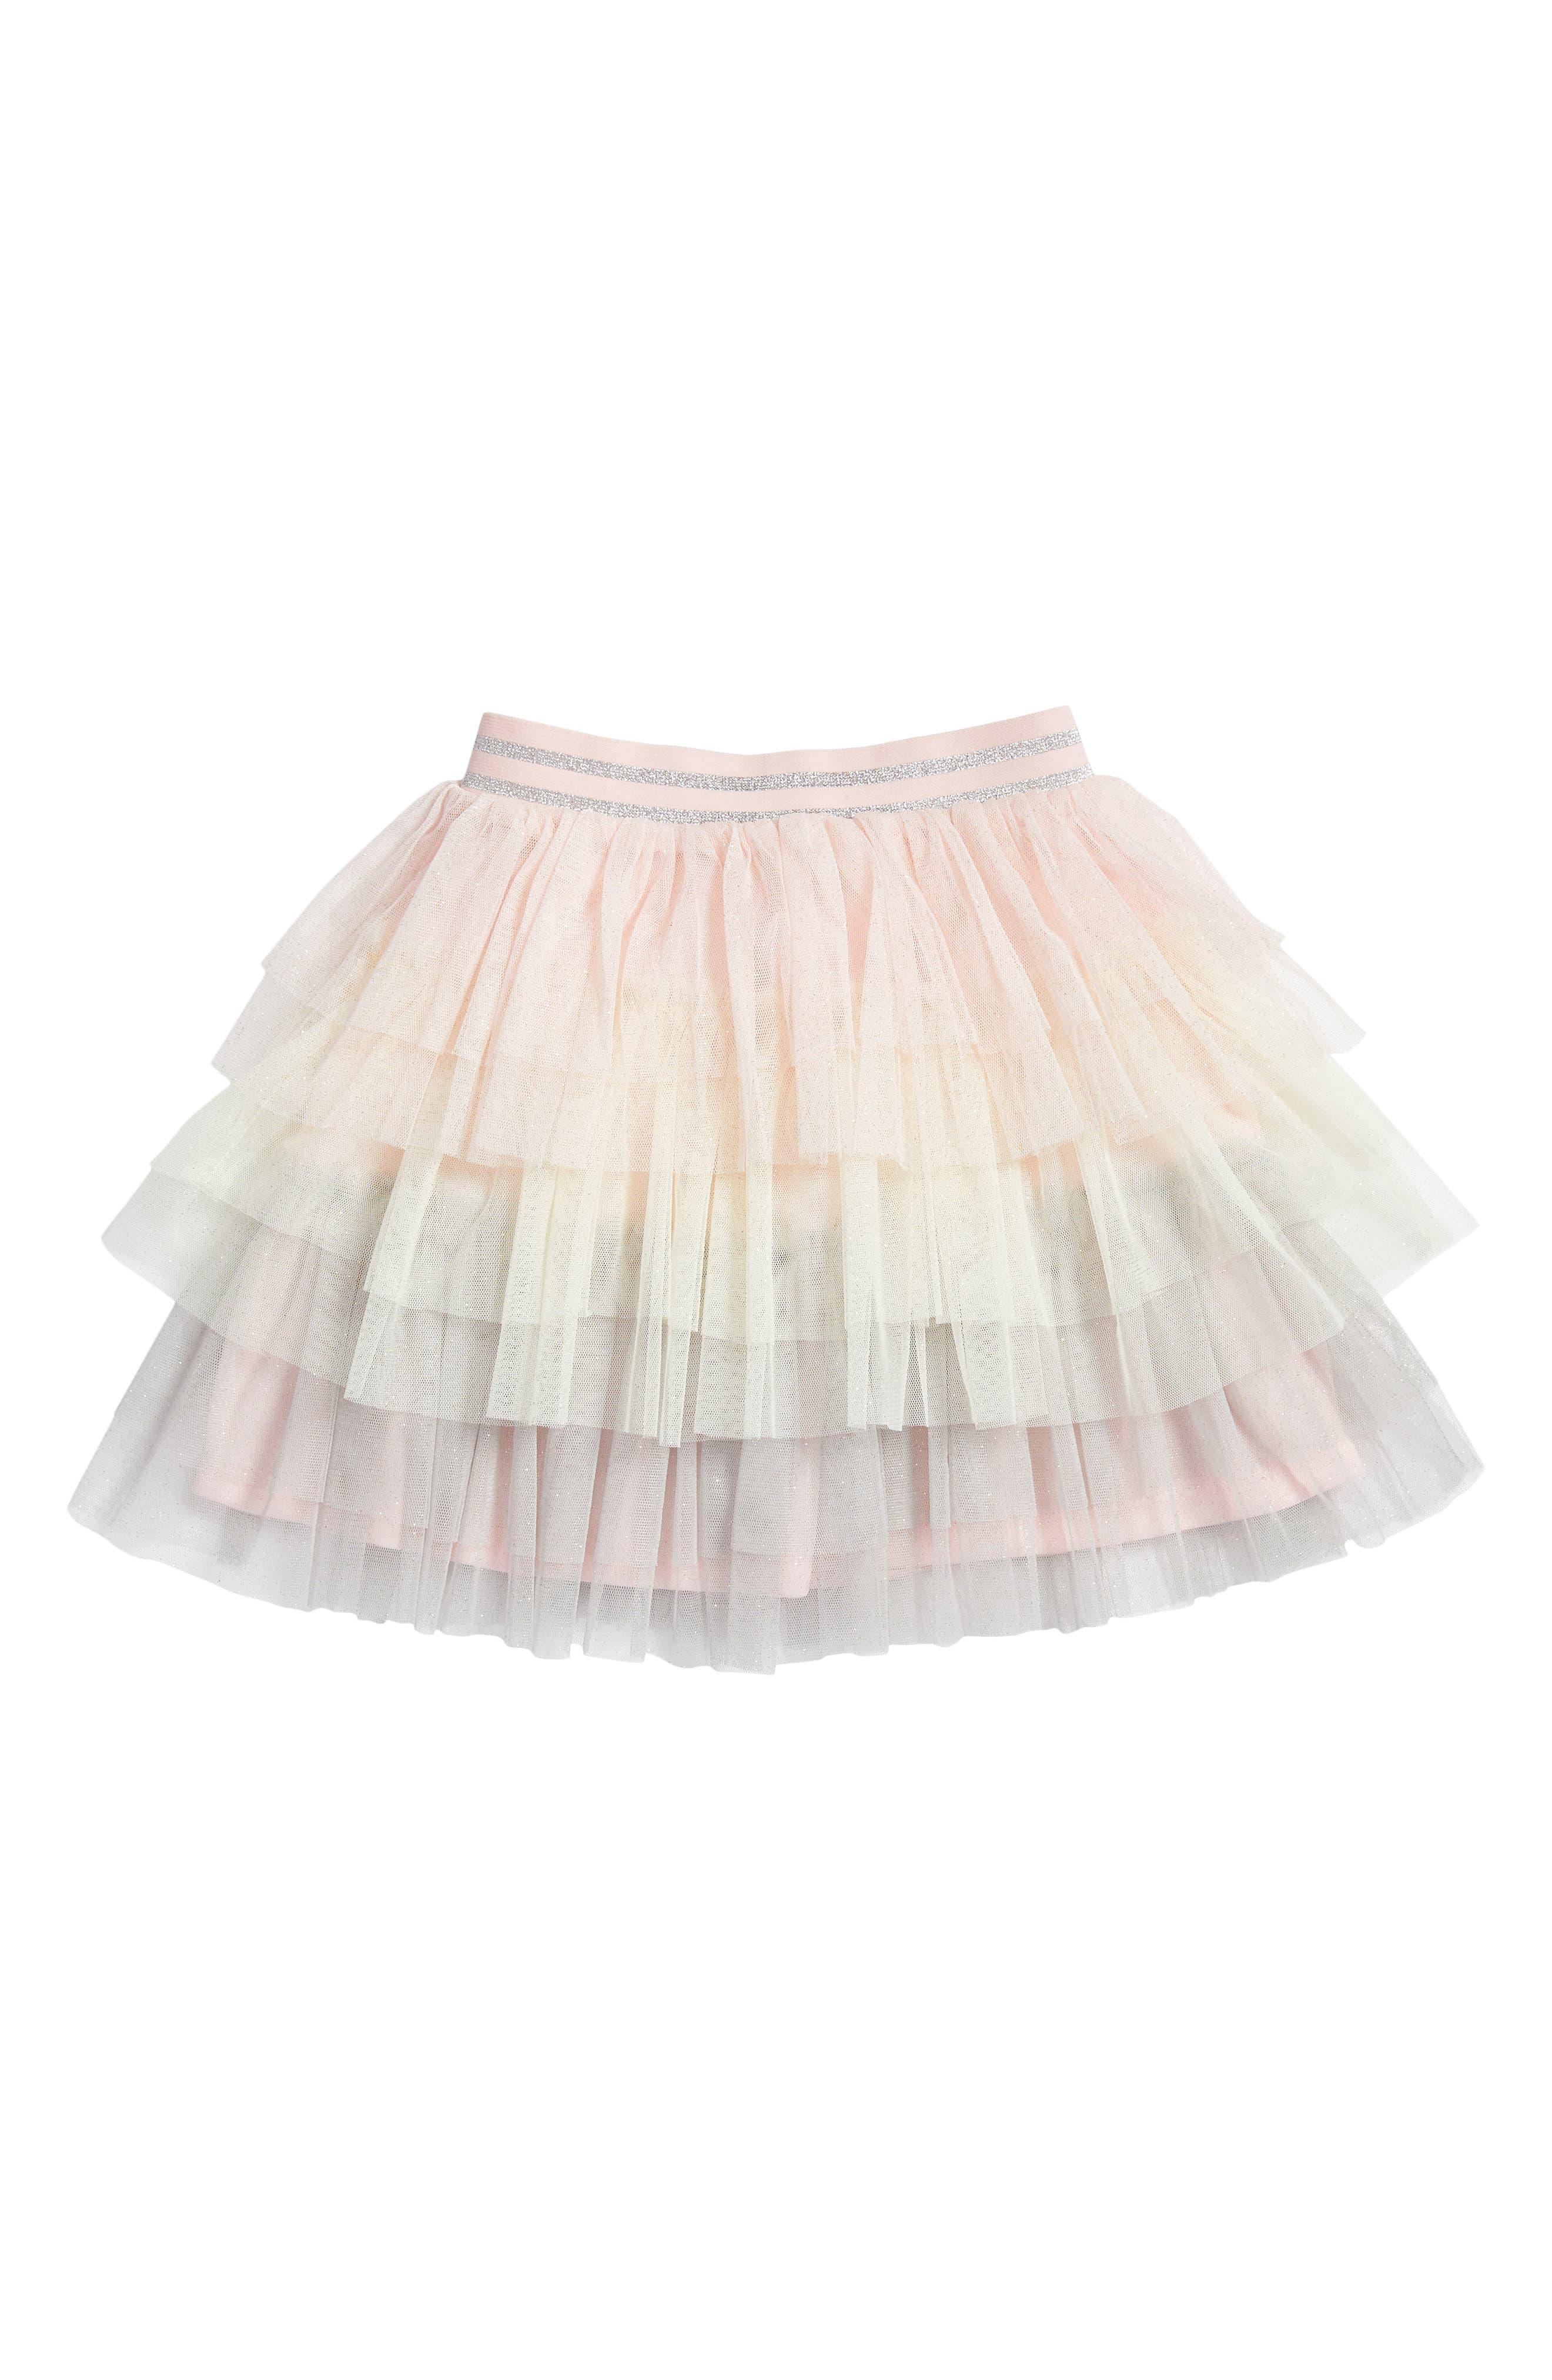 Tiered Tutu Skirt,                         Main,                         color, Pink Multi